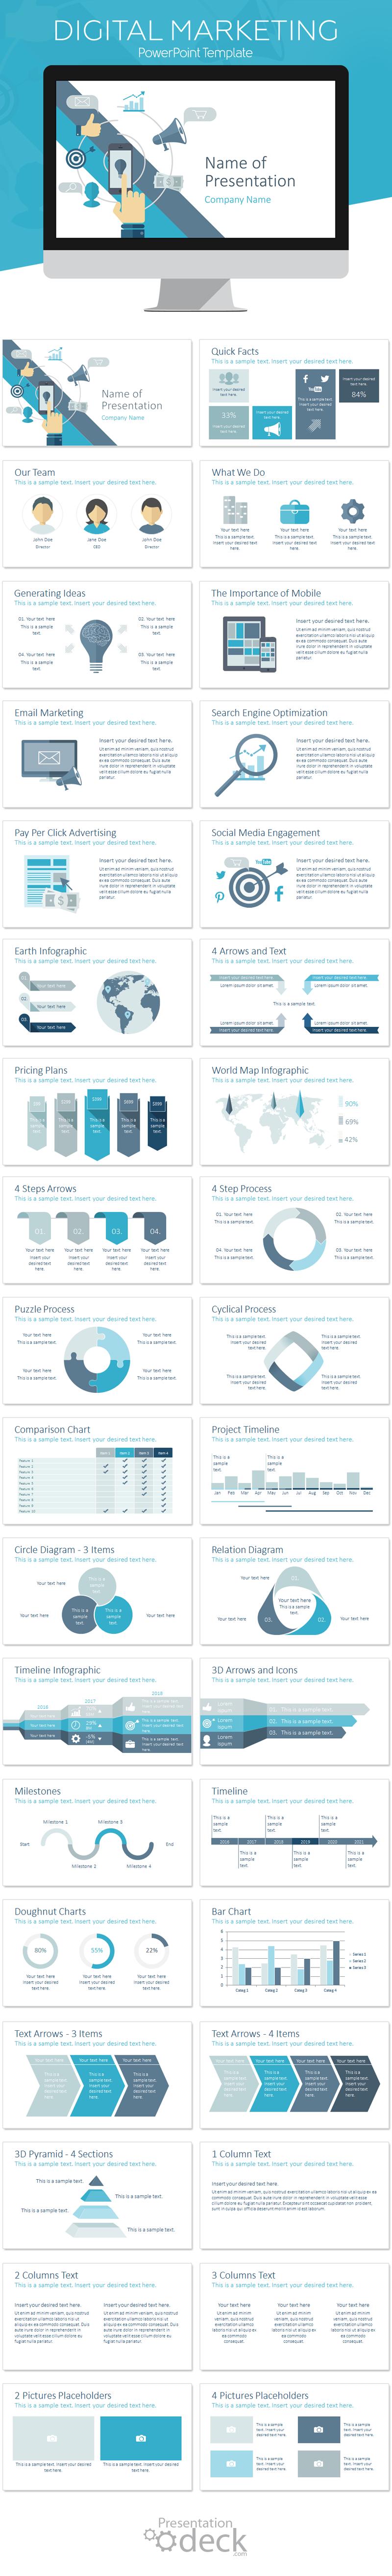 digital marketing powerpoint template | powerpoint templates, Digital Marketing Presentation Template, Presentation templates